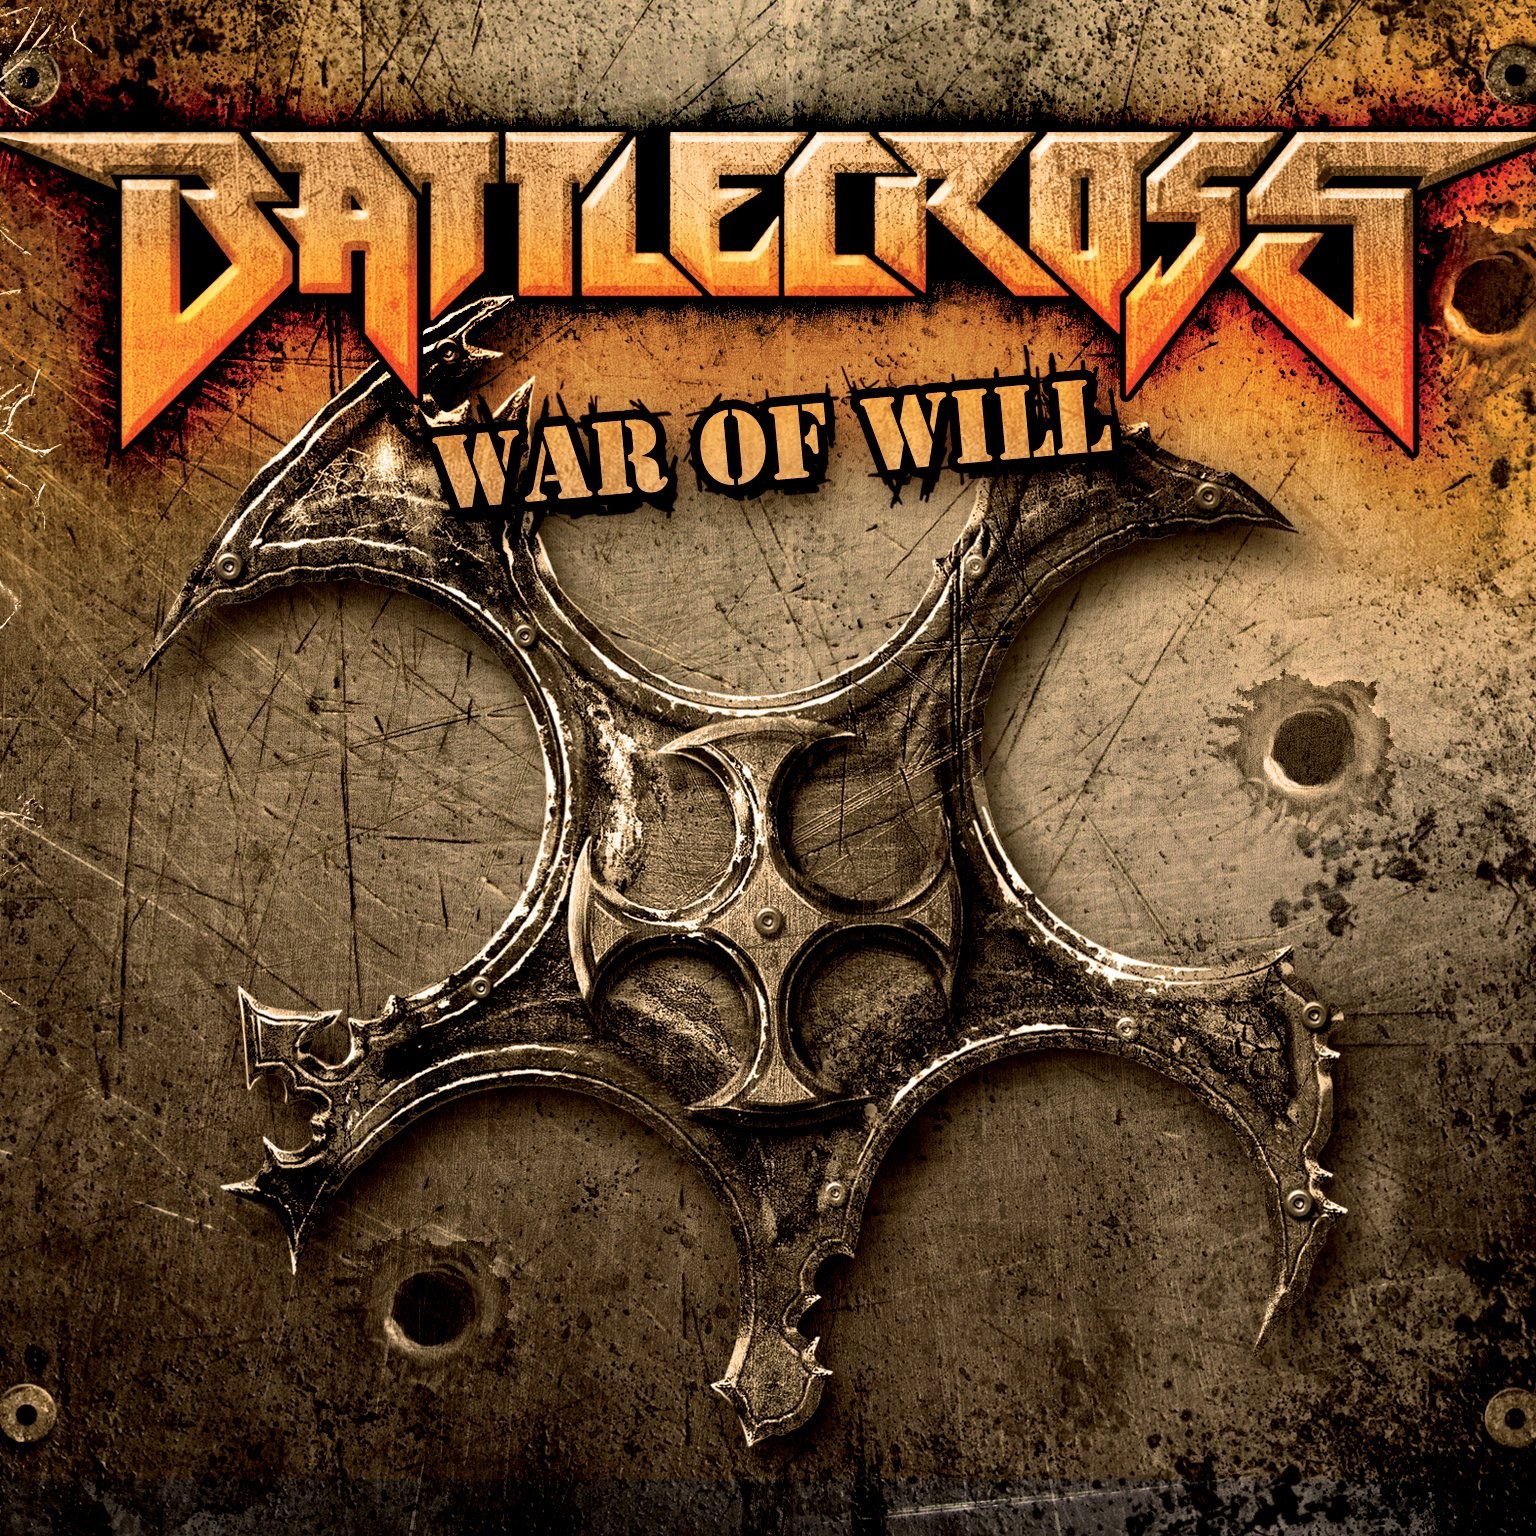 Vinilo : Battlecross - War of Will (Picture Disc Vinyl LP)